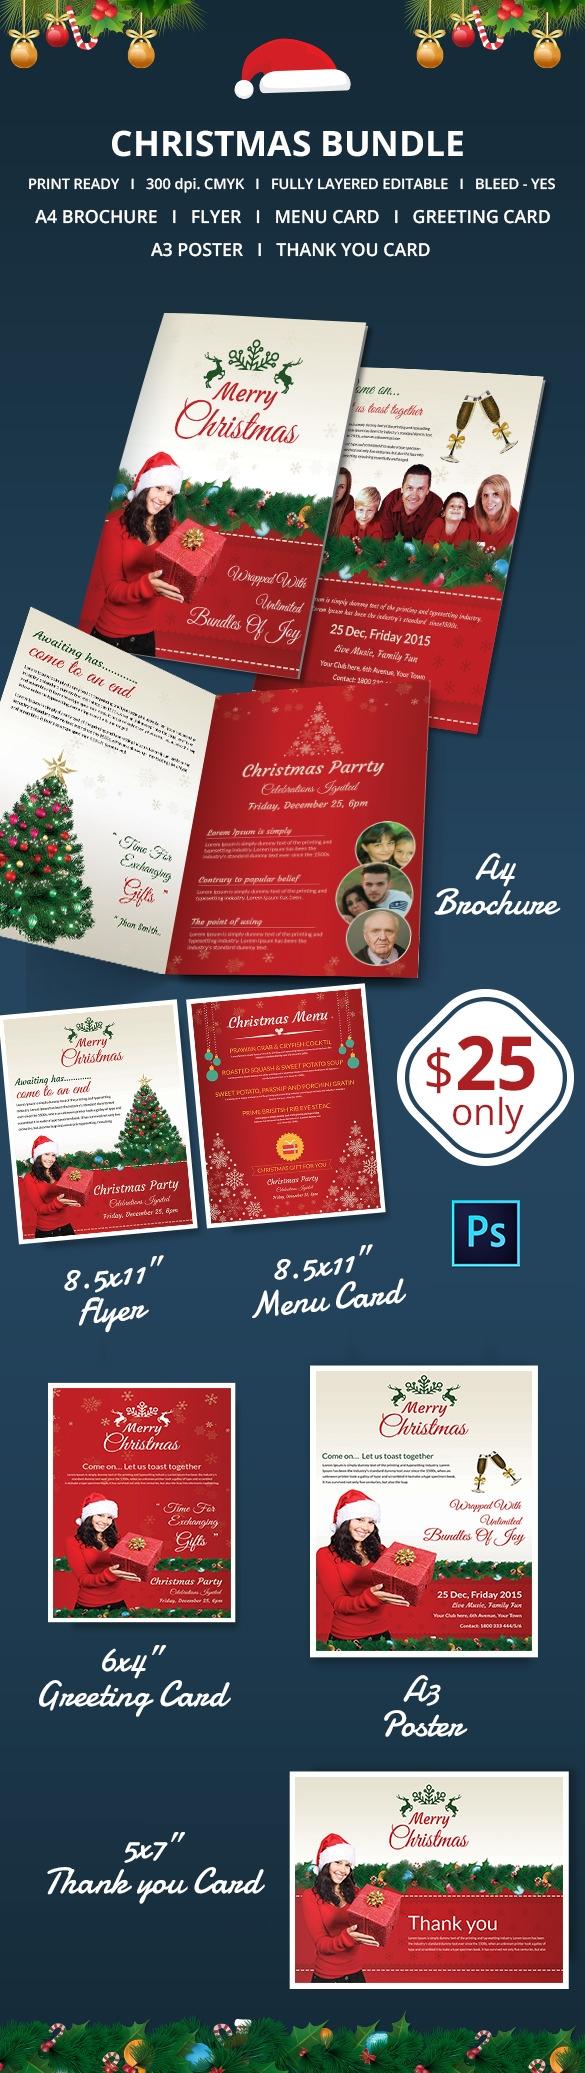 78 Christmas Flyer Templates Psd Ai Illustrator Word Free